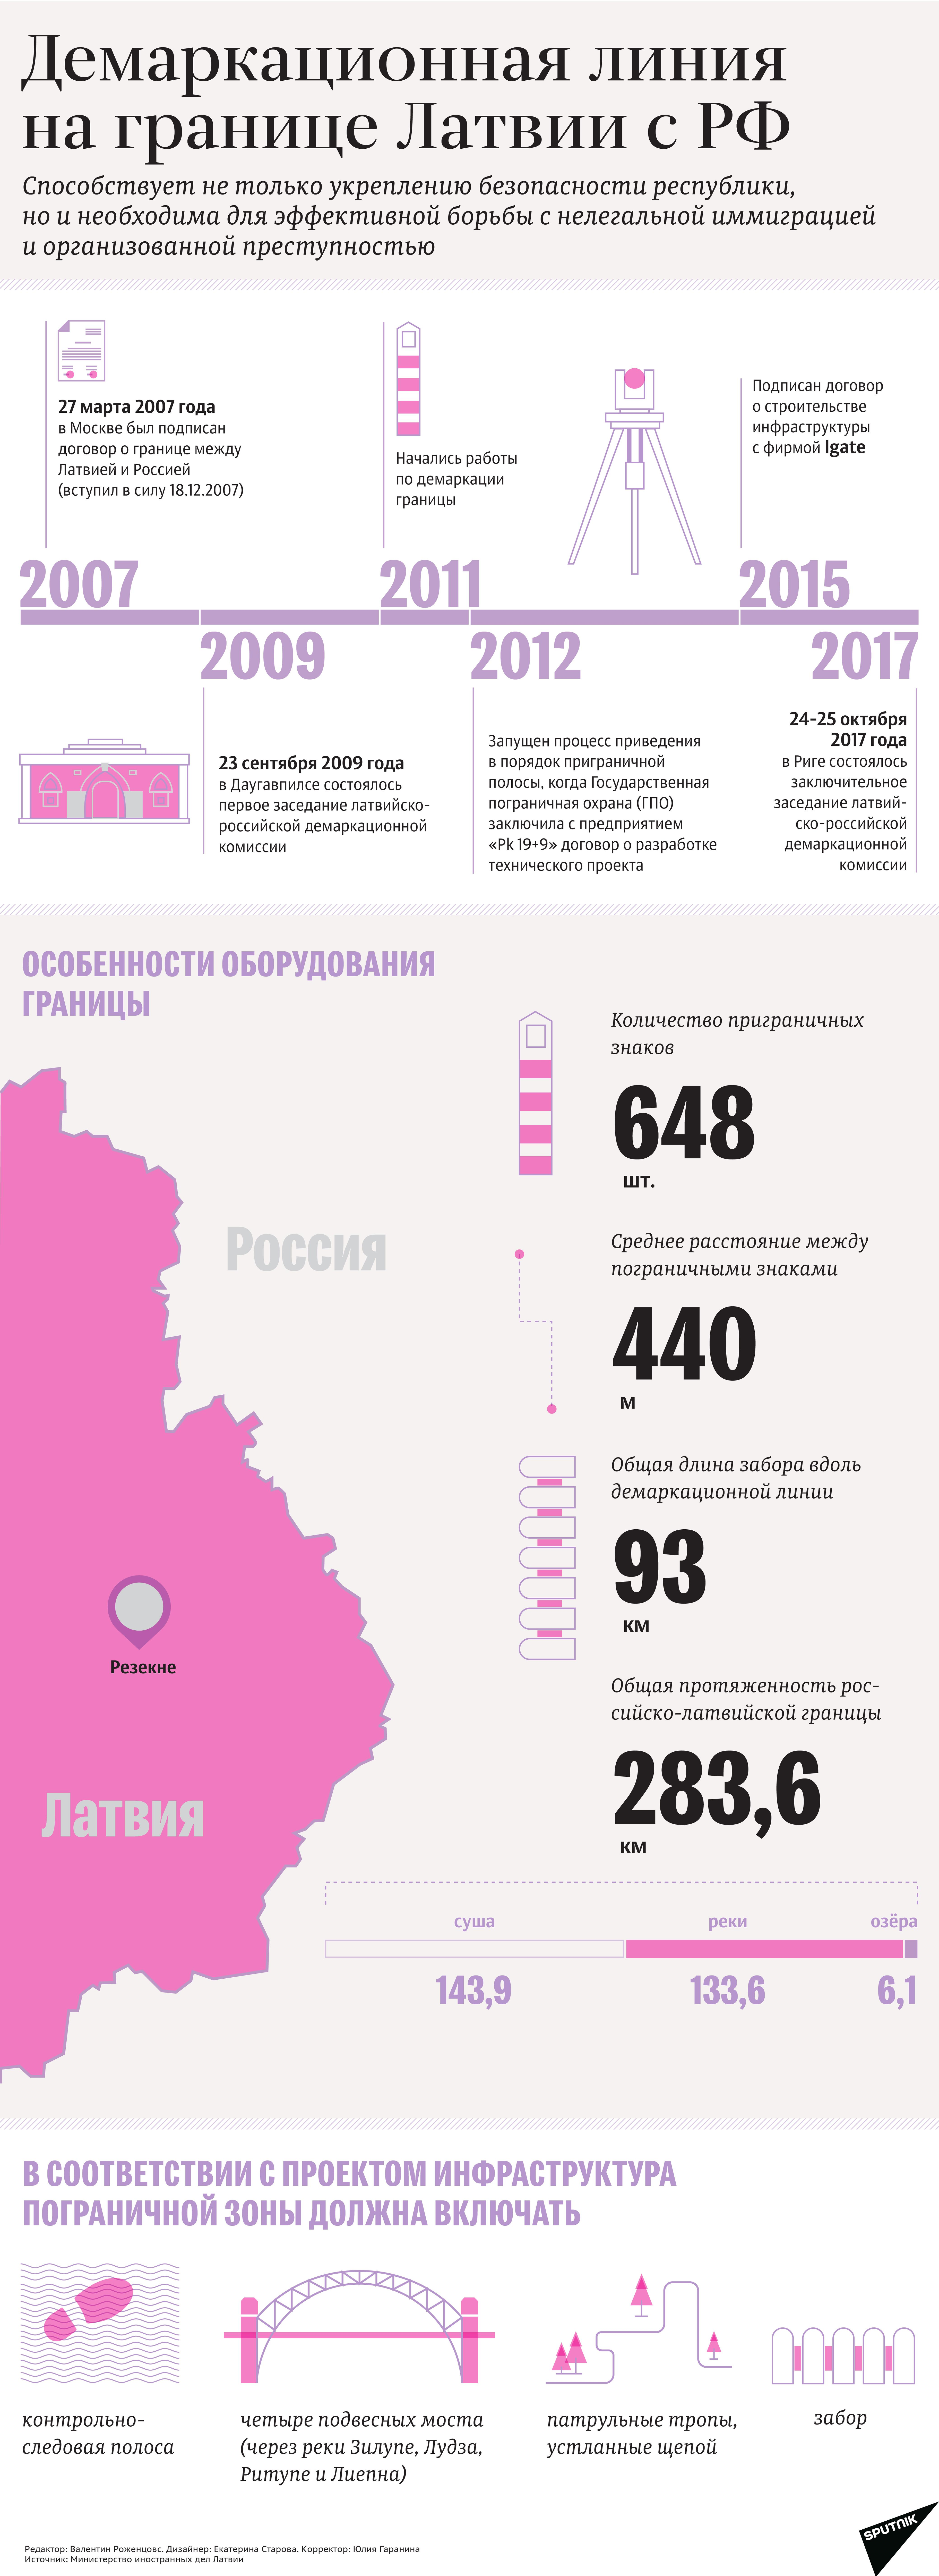 Демаркационная линия на границе Латвии с РФ